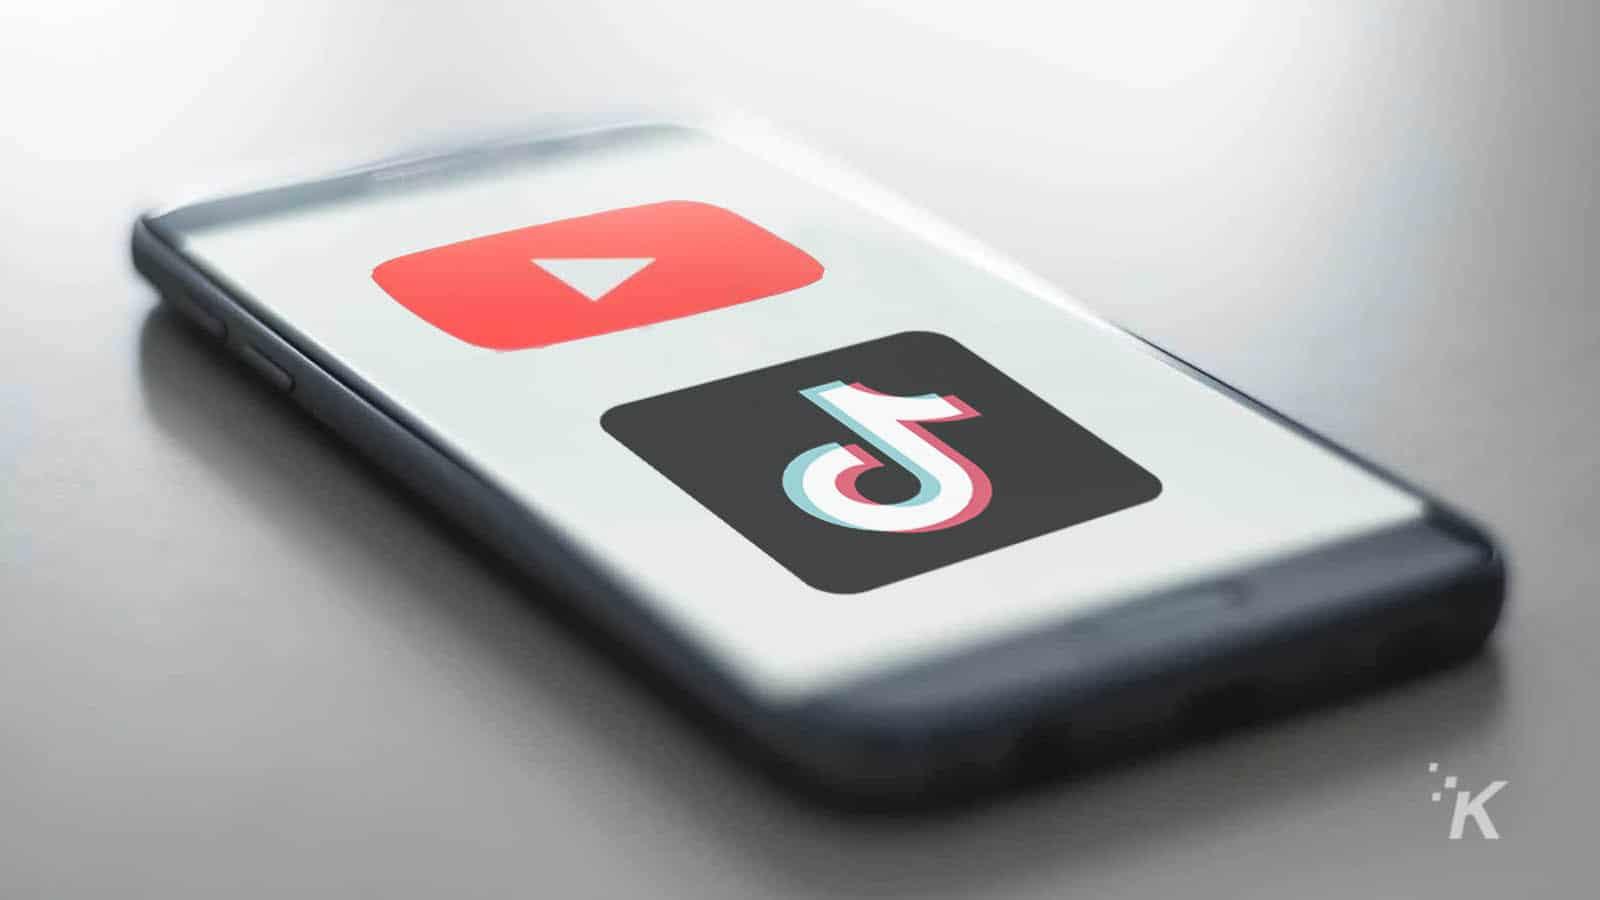 youtube and tiktok logos on phone